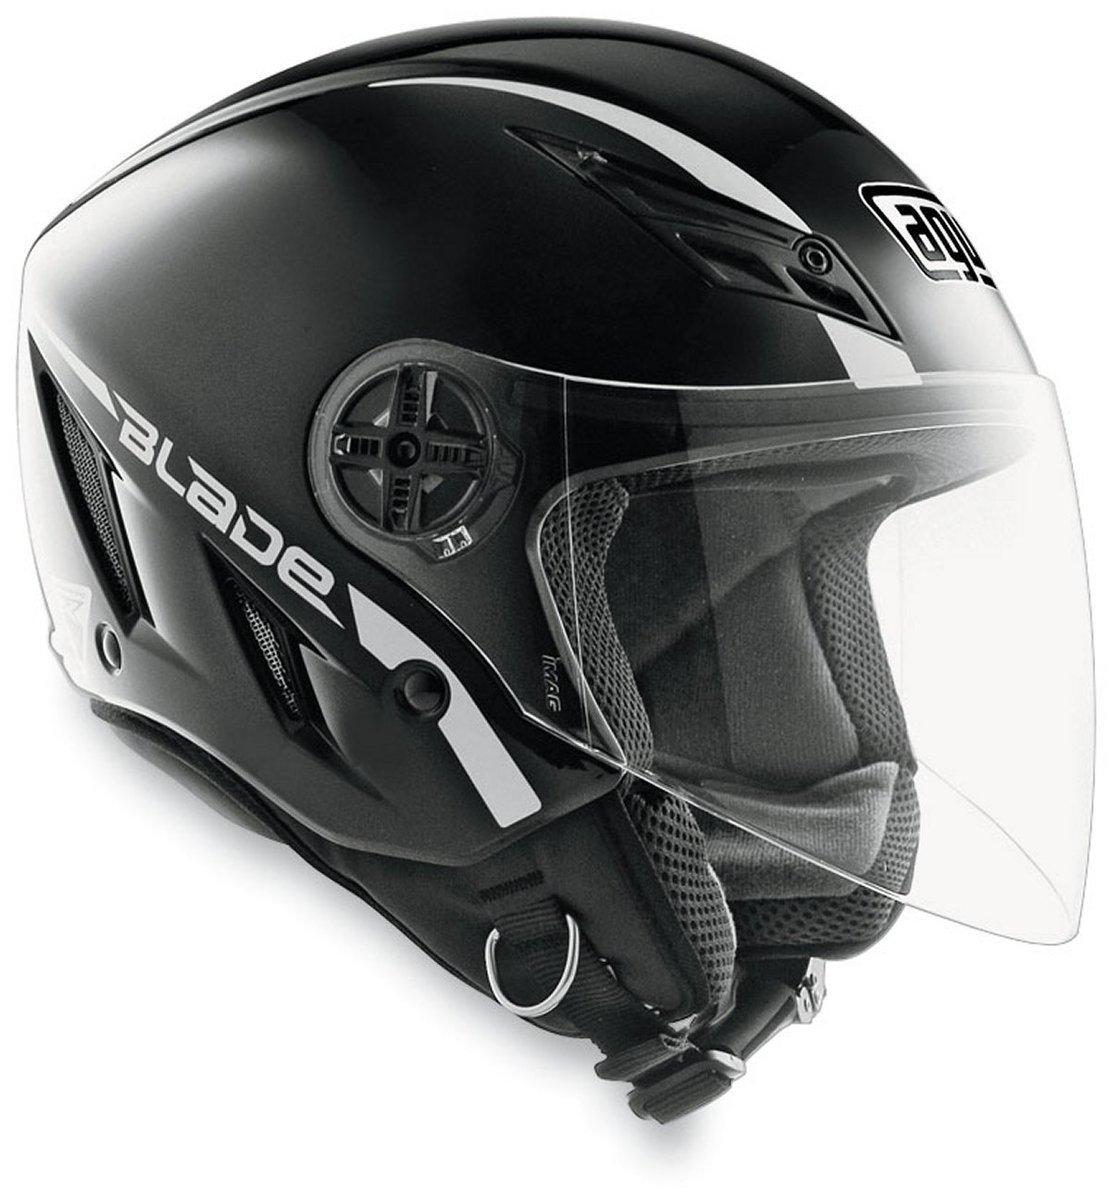 Blade Helmet Solid Colors